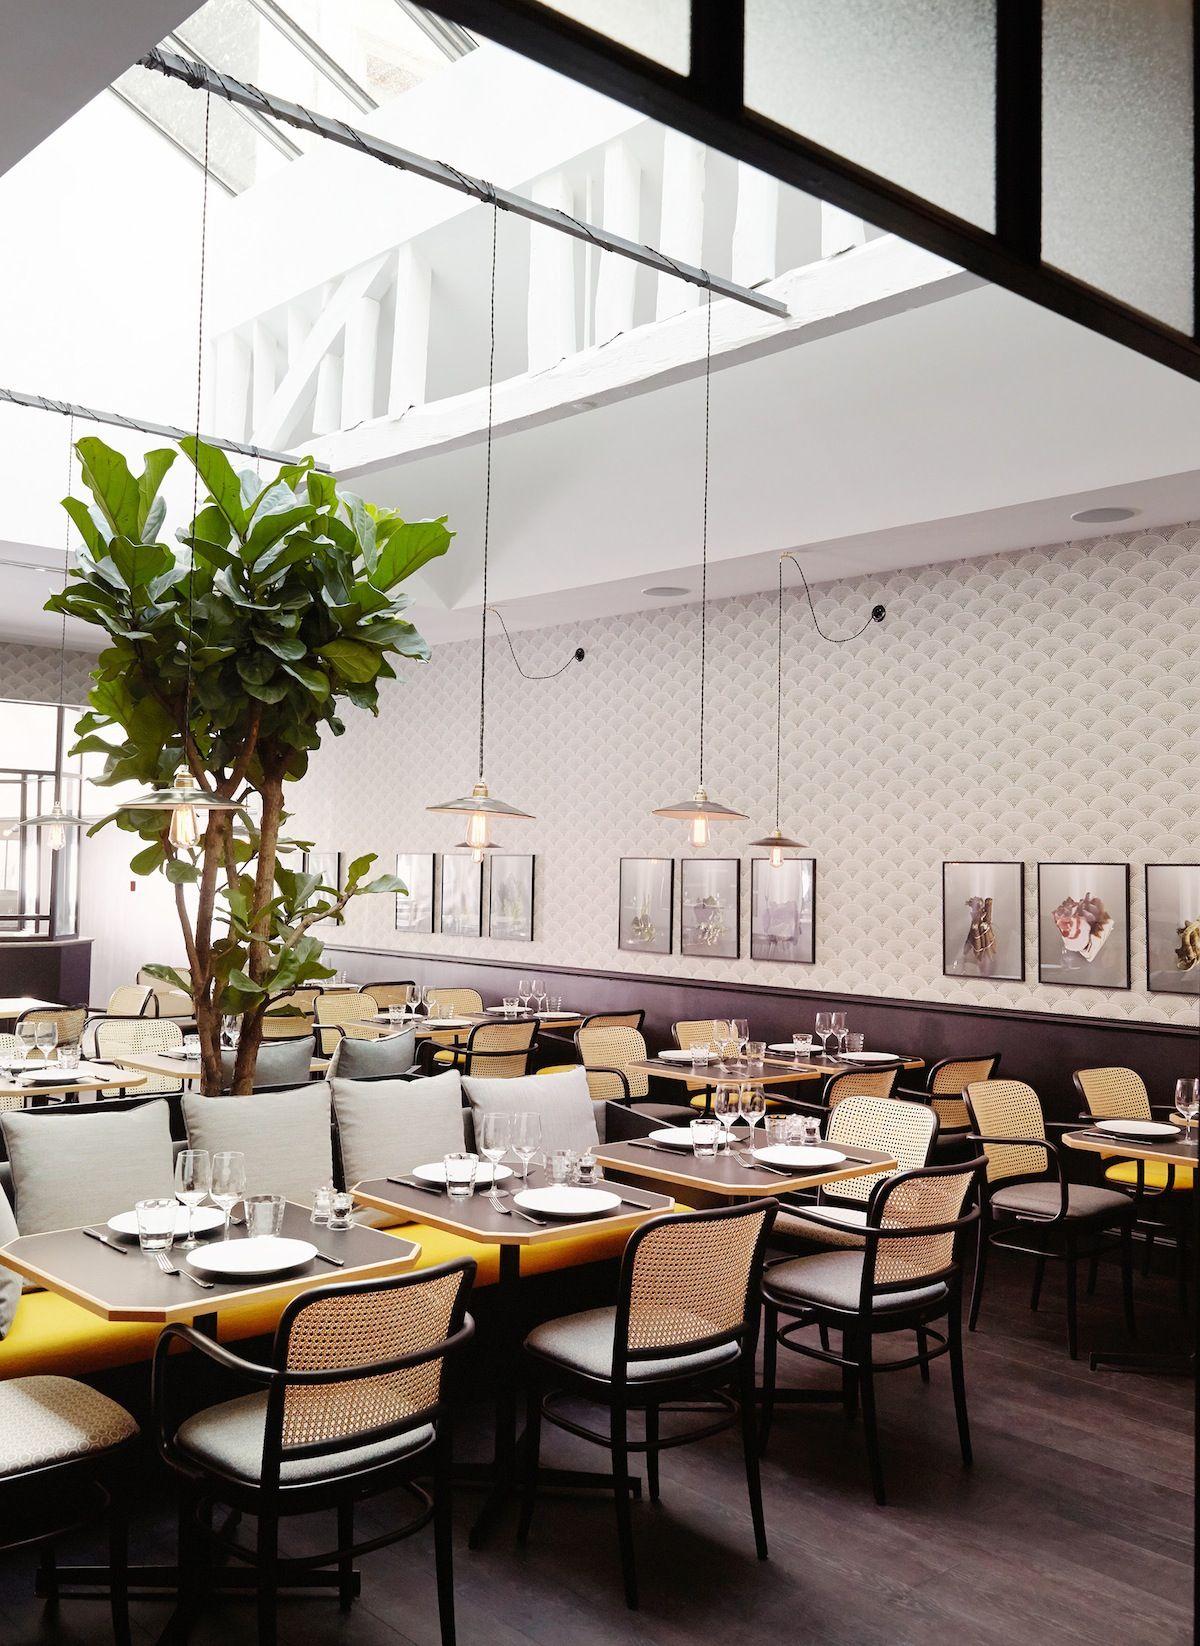 Manger Restaurant, Paris   Restaurants, Restaurant design and ...